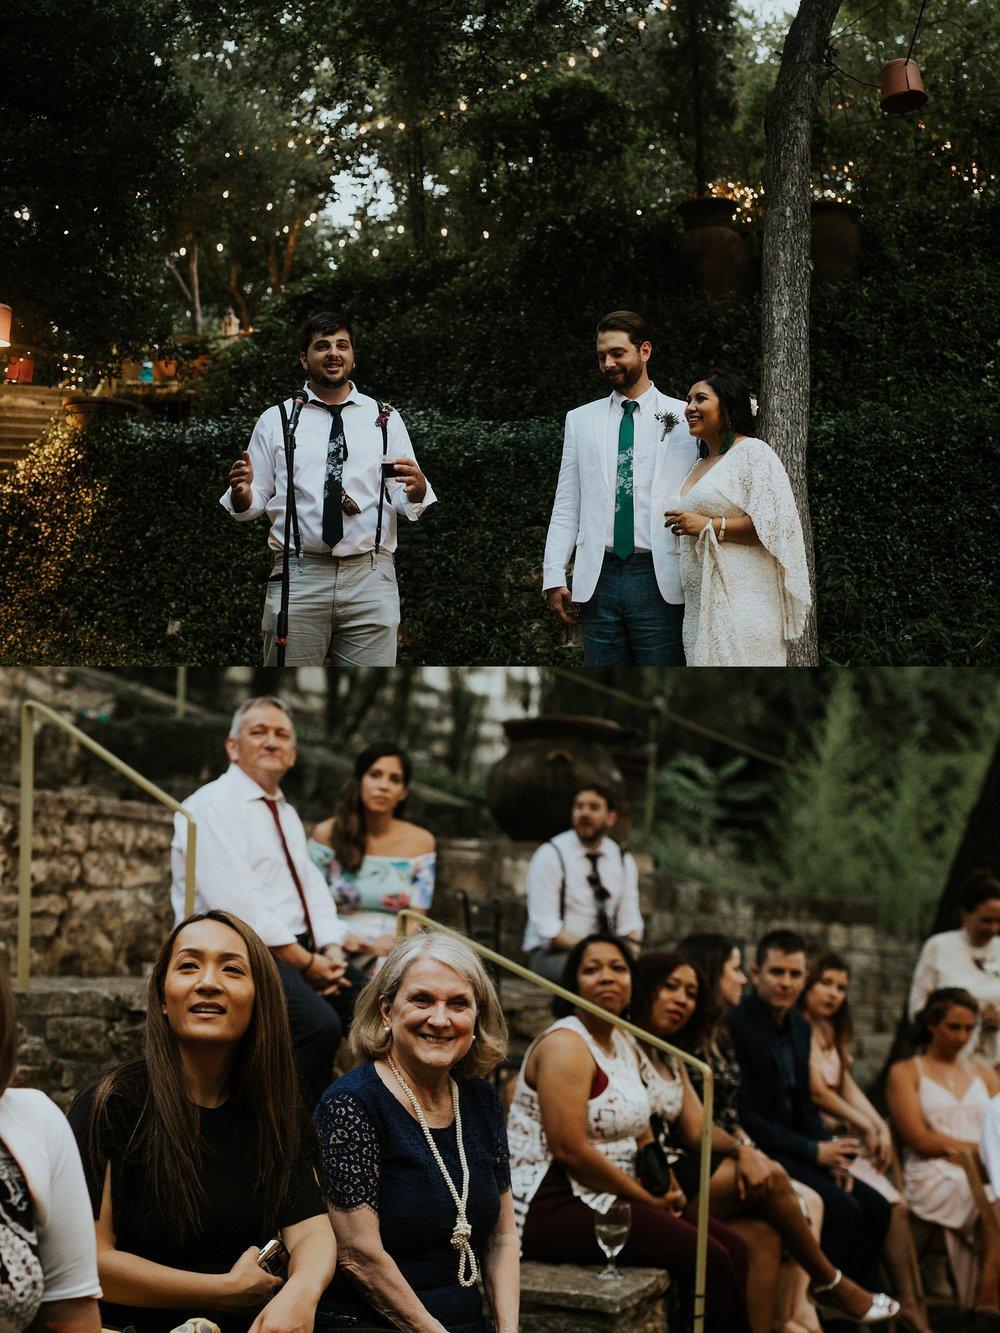 Vibrant Spring Wedding at the enchanting Jennifer's Gardens in Downtown Austin Texas_0041.jpg